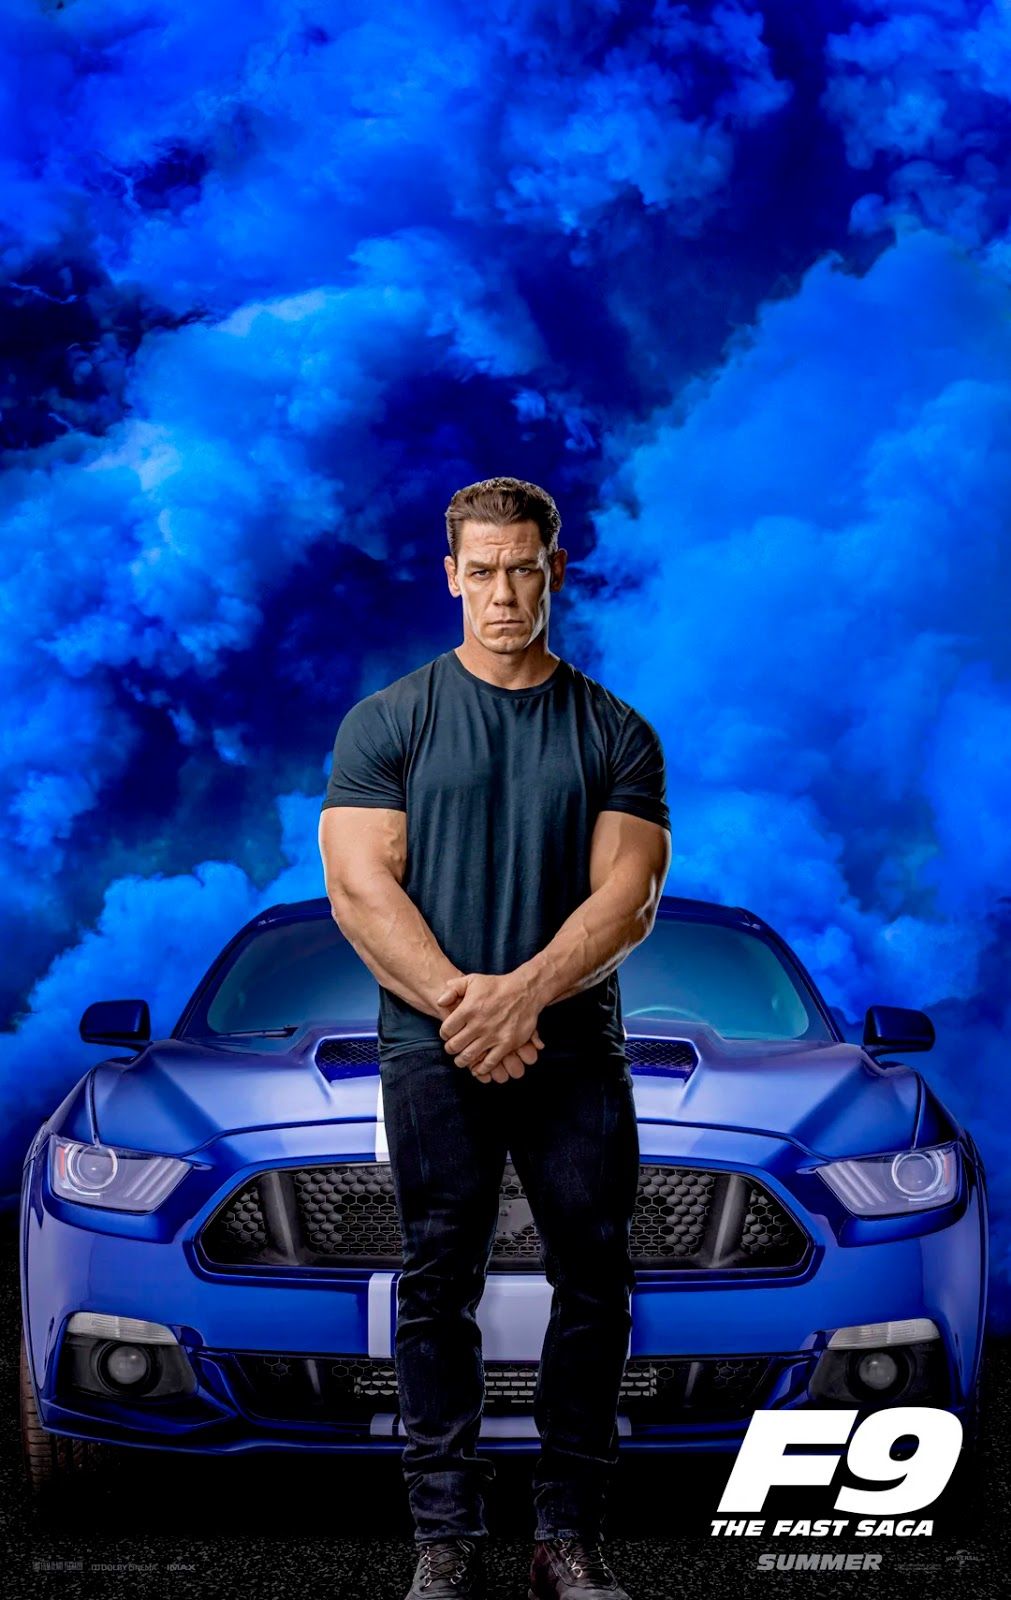 Velozes e Furiosos 9 - Poster John Cena